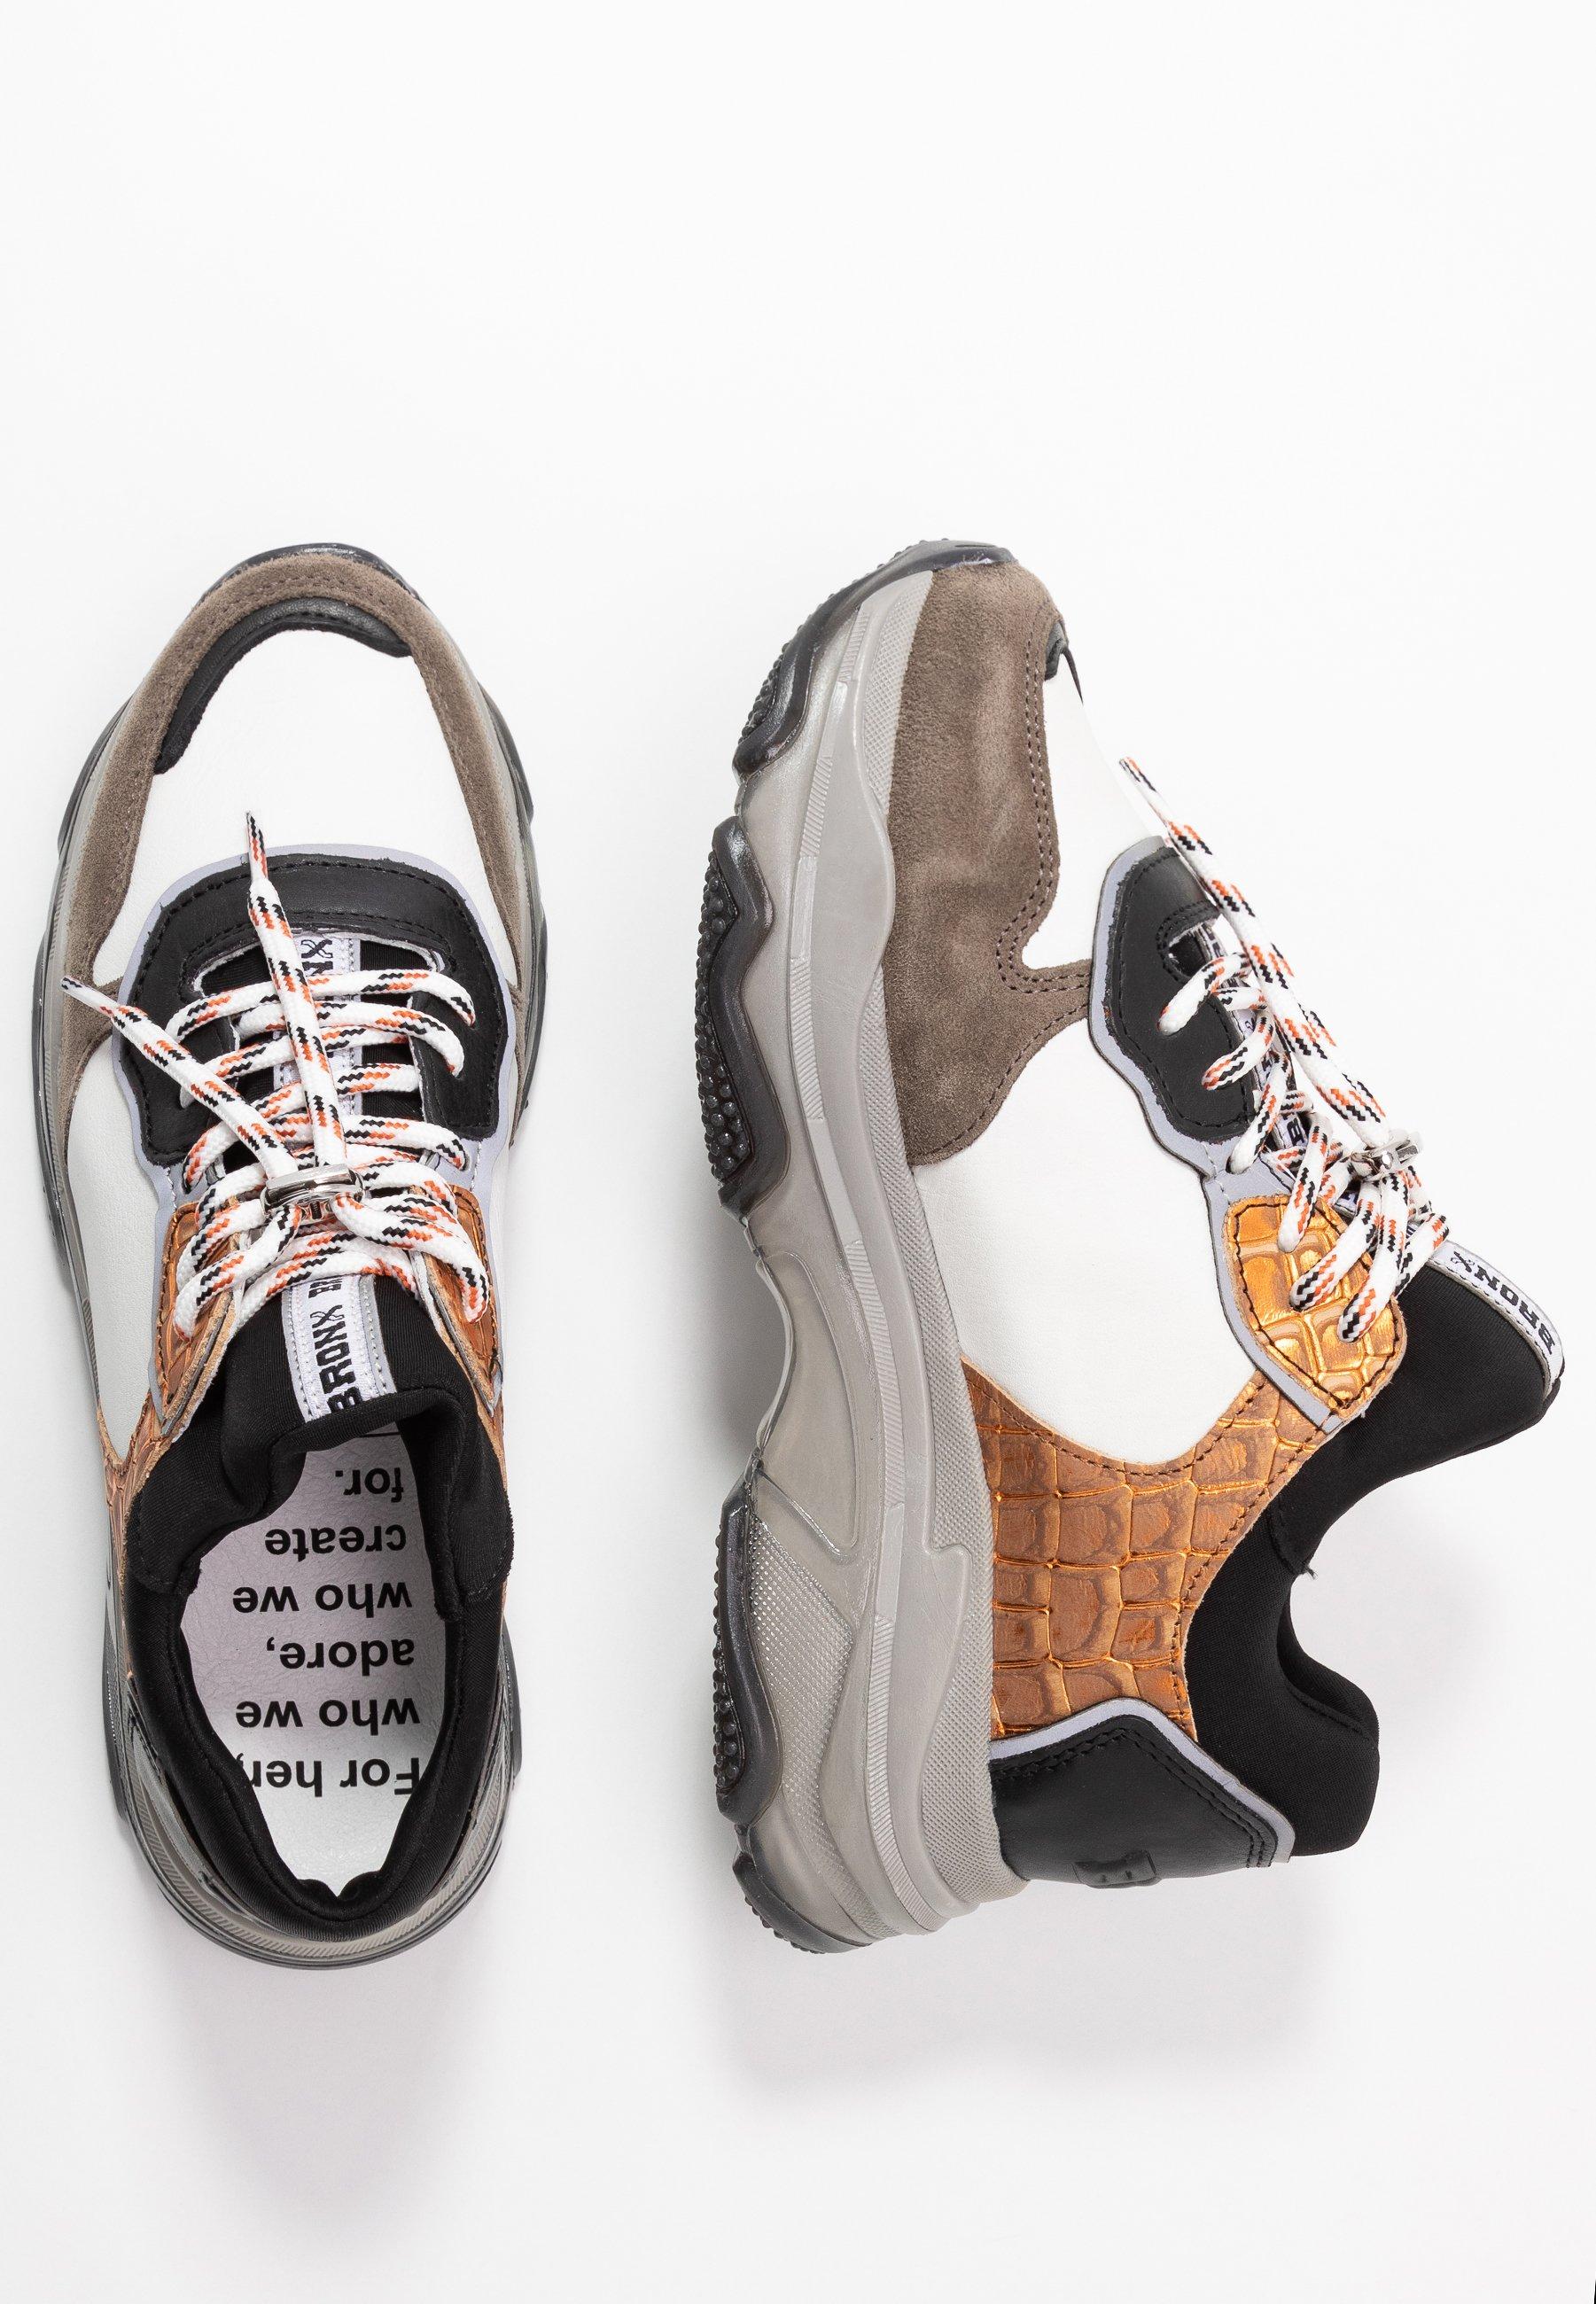 BAISLEY Sneakers dark greywhiteblackorange